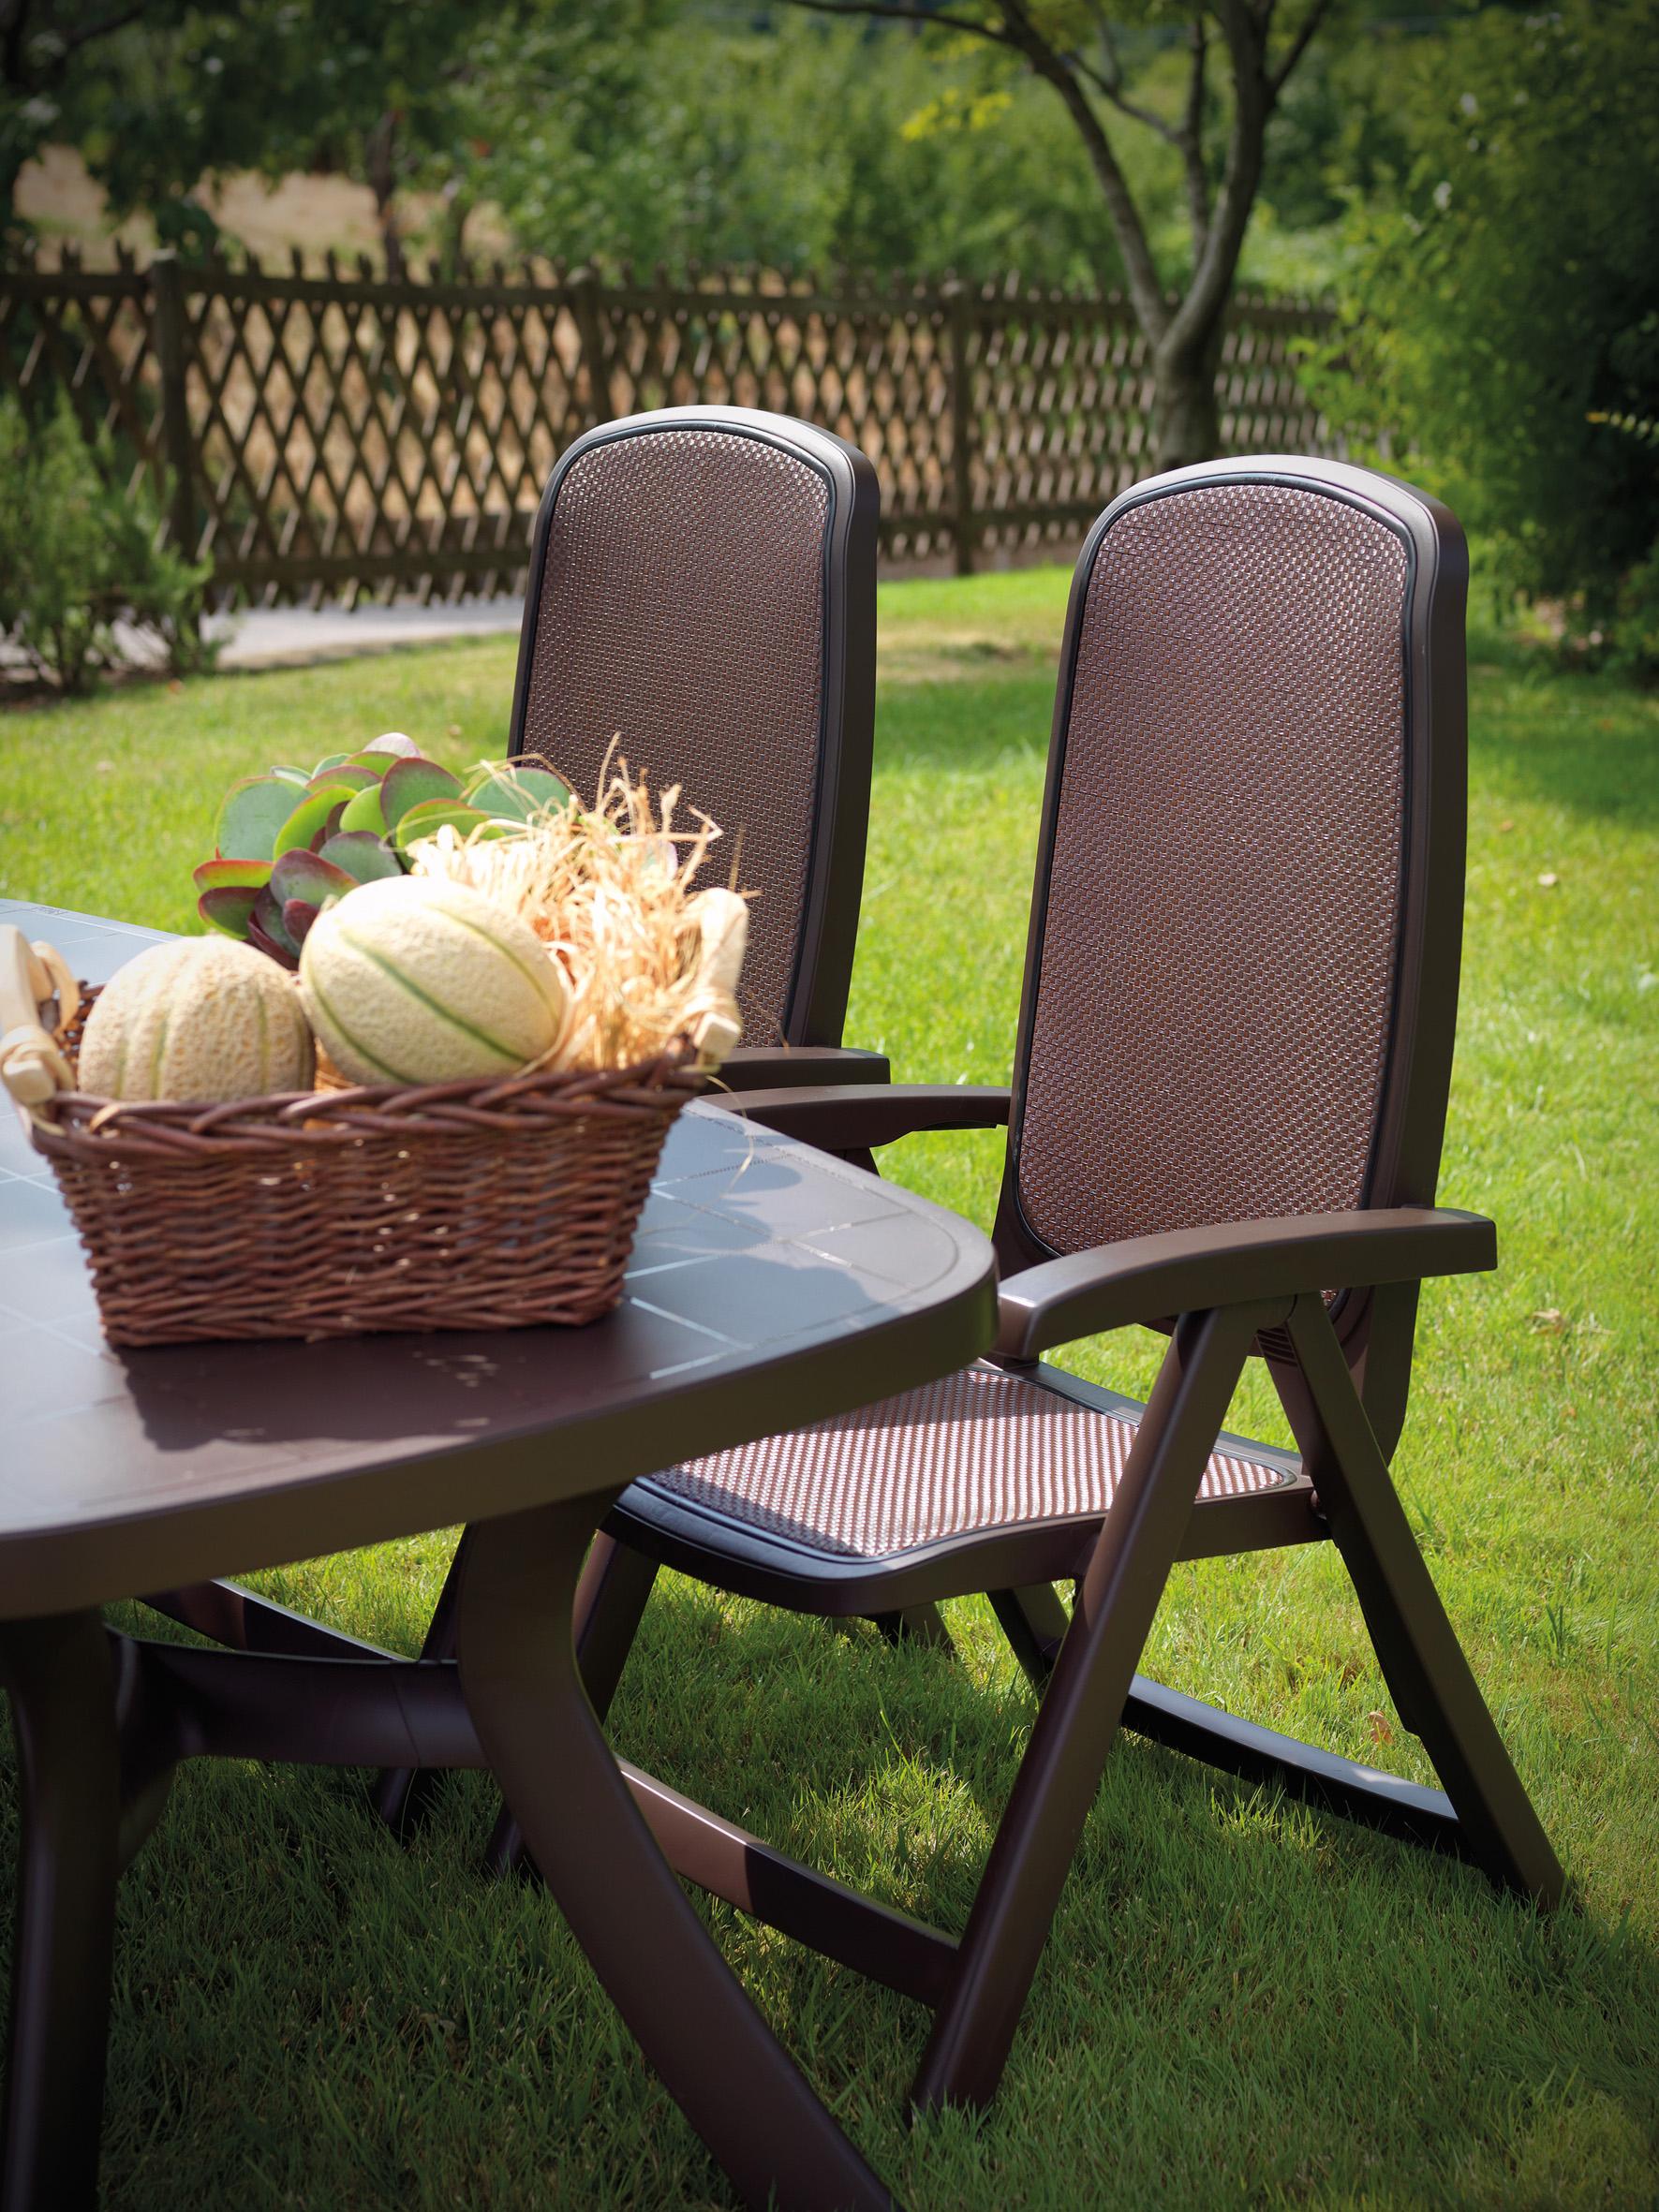 Fotel ogrodowy składany Delta Nardi